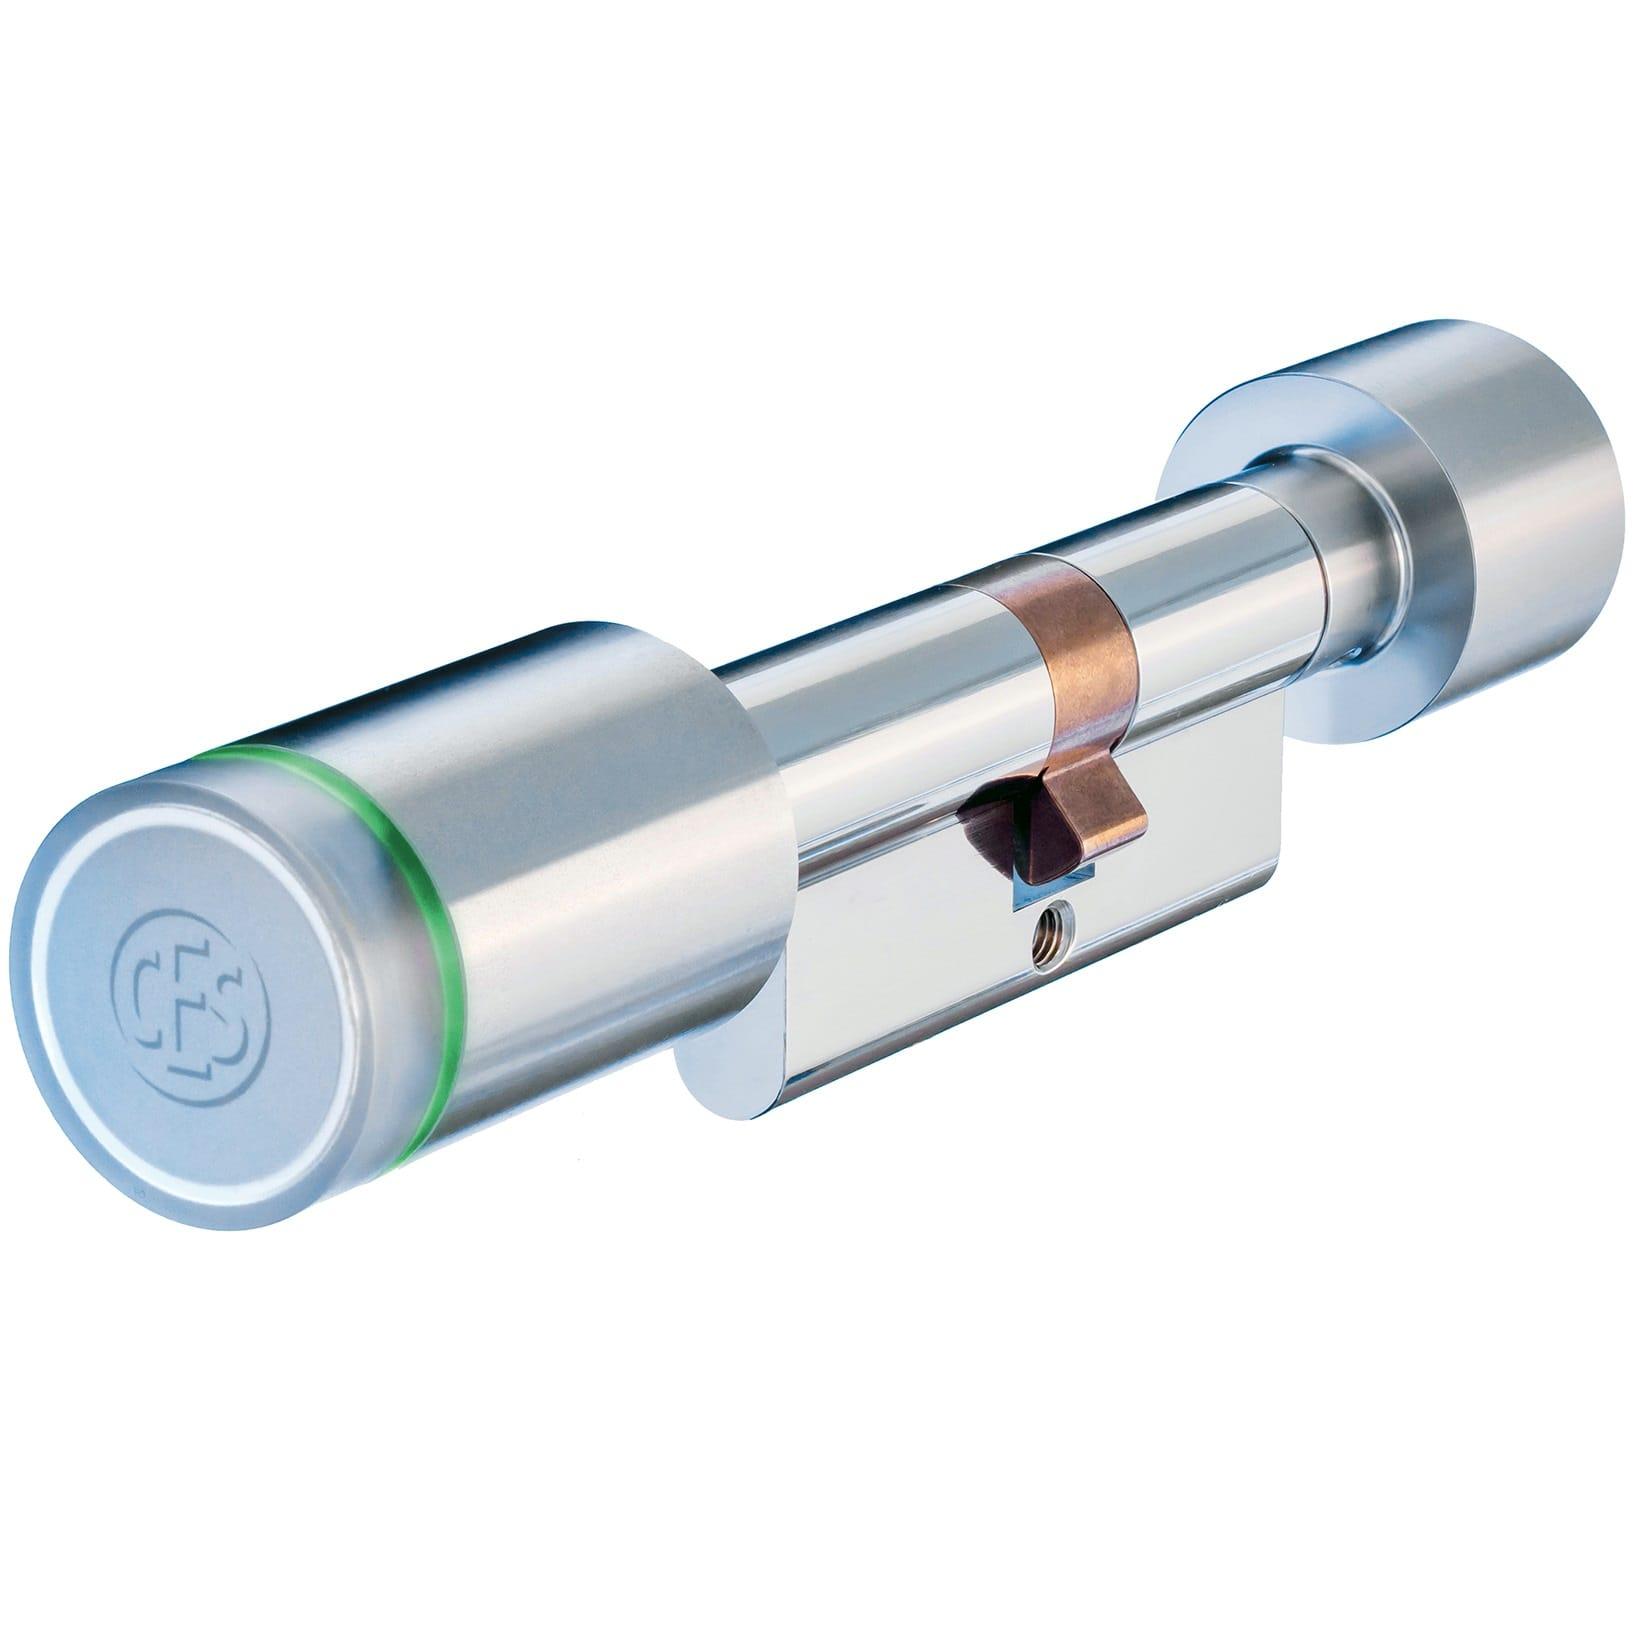 CES Omega Flex Doppelknaufzylinder